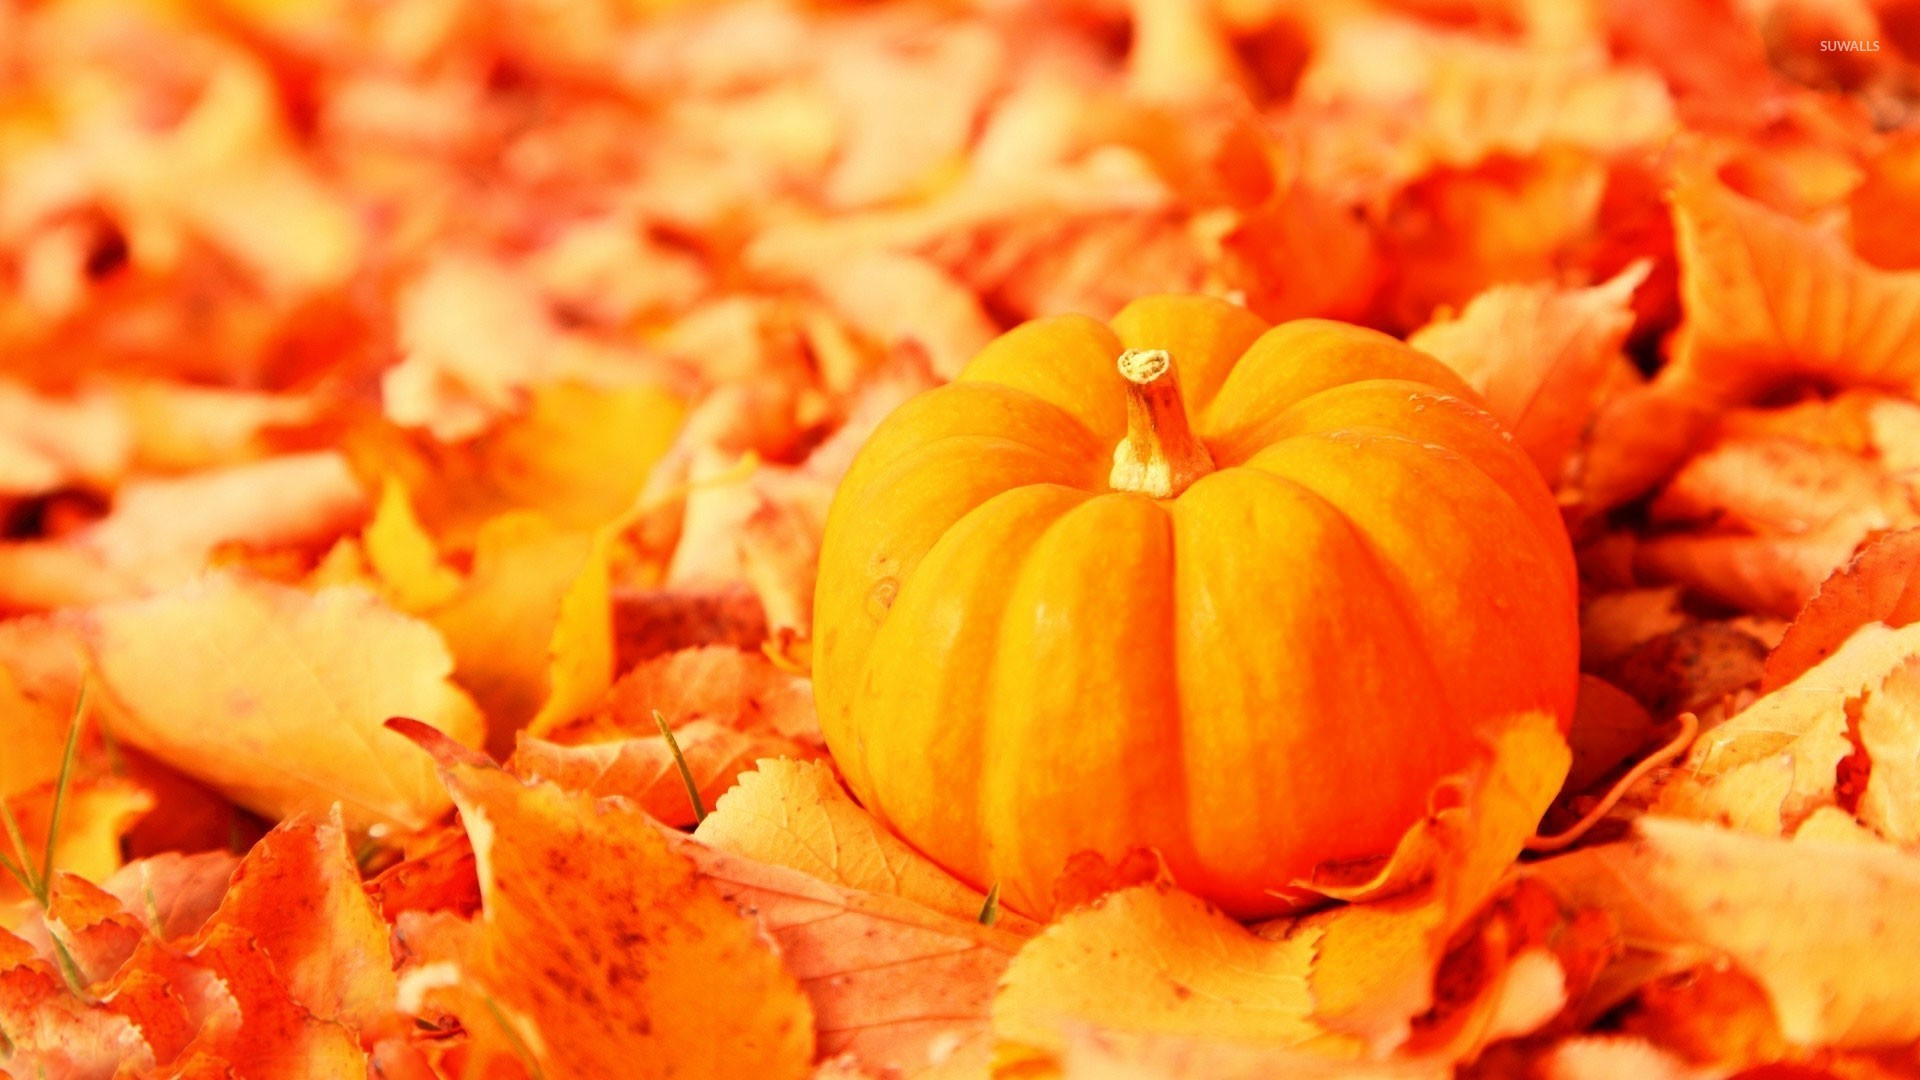 Pumpkin among the leaves wallpaper jpg